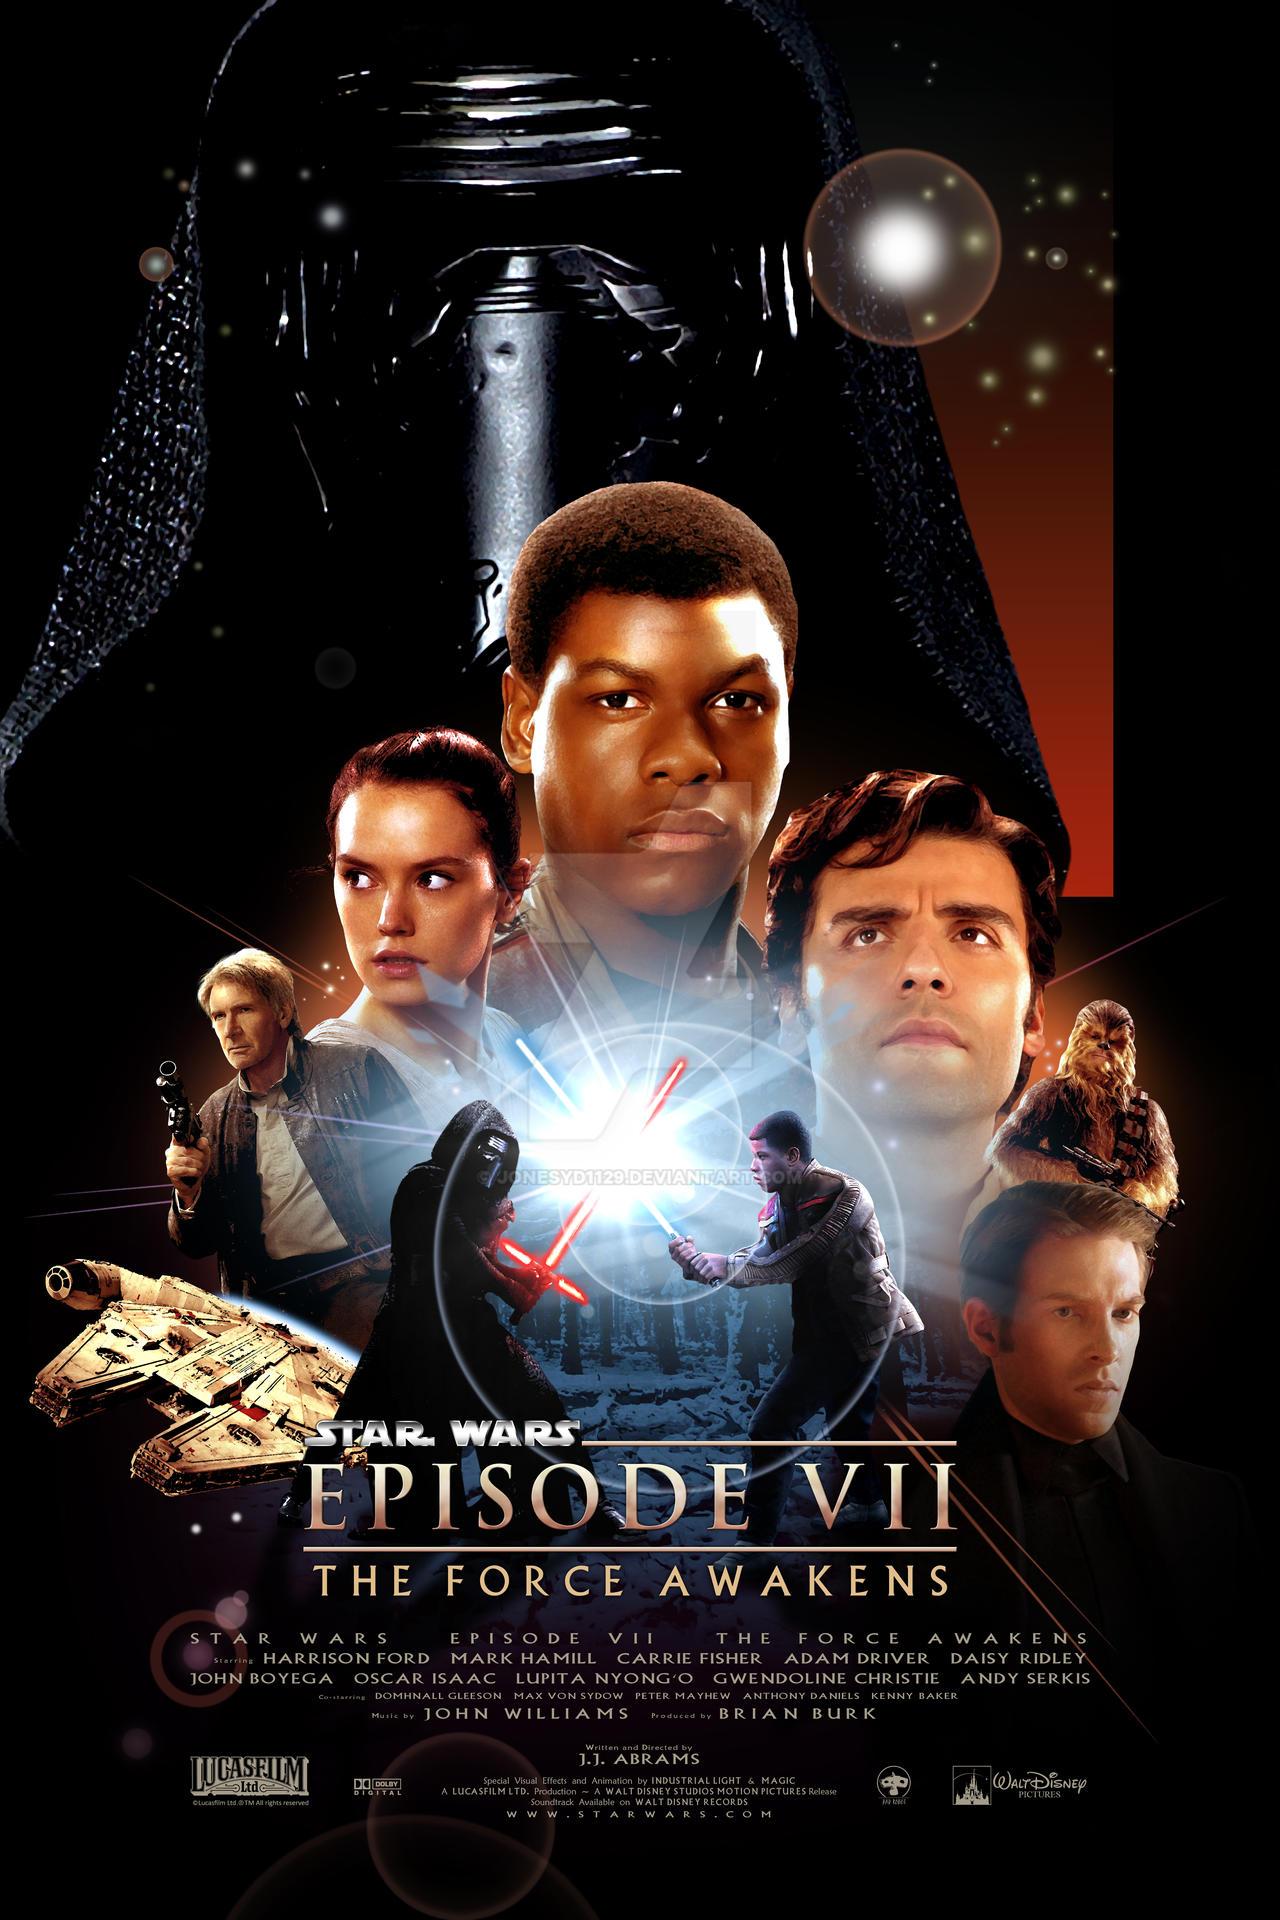 Star Wars Episode Vii Revenge Of The Sith By Jonesyd1129 On Deviantart